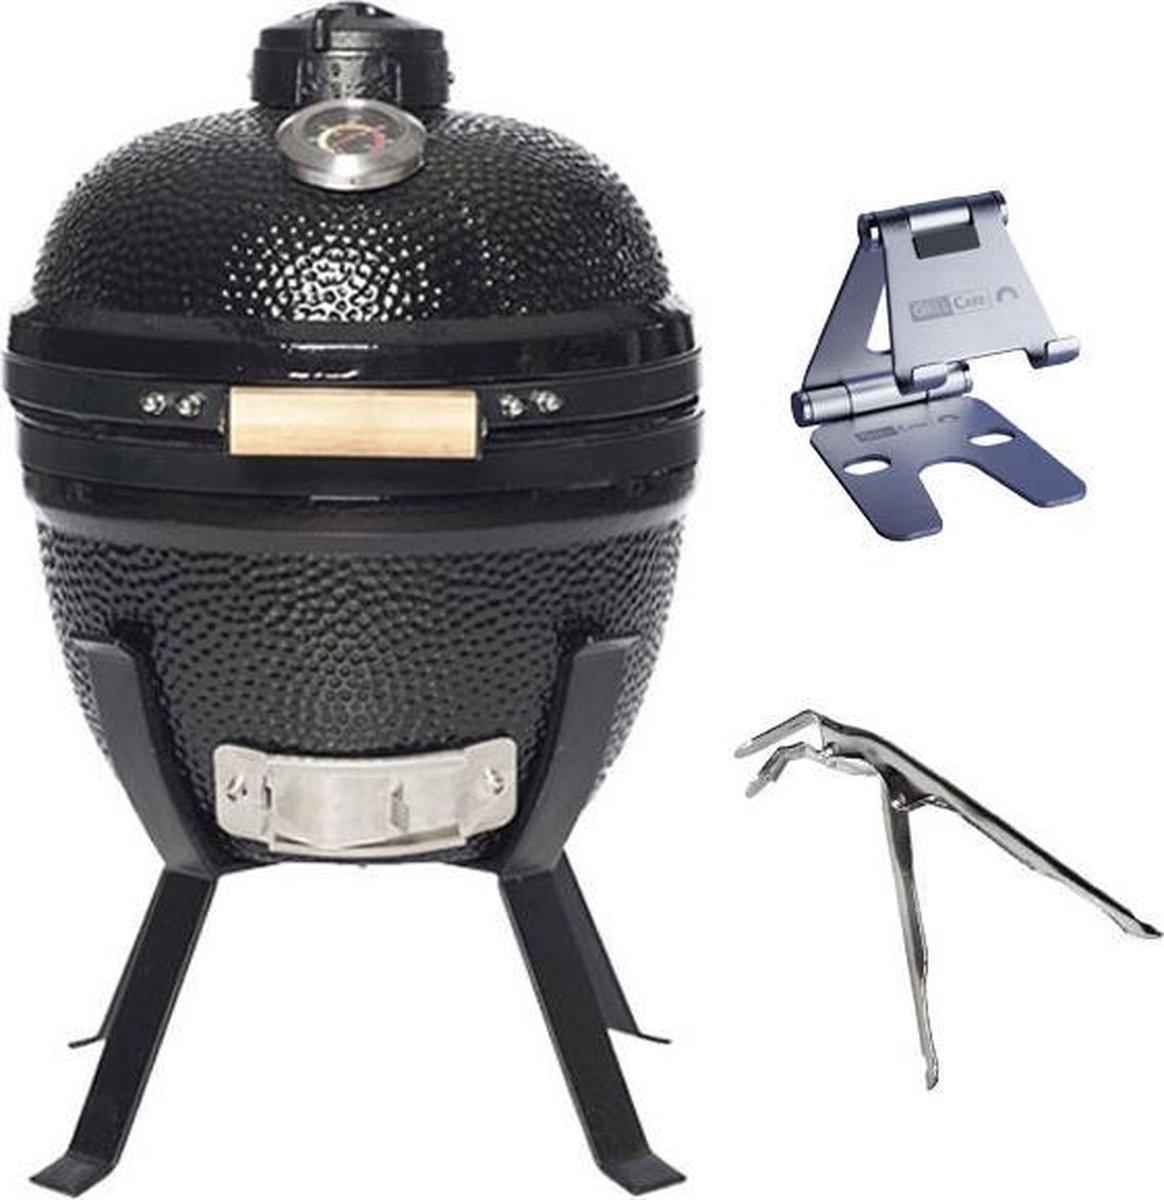 "Grill Care Kamado Grill - 14"" - Grillrooster Ø 32 cm - Met Handgreep - Zwart"